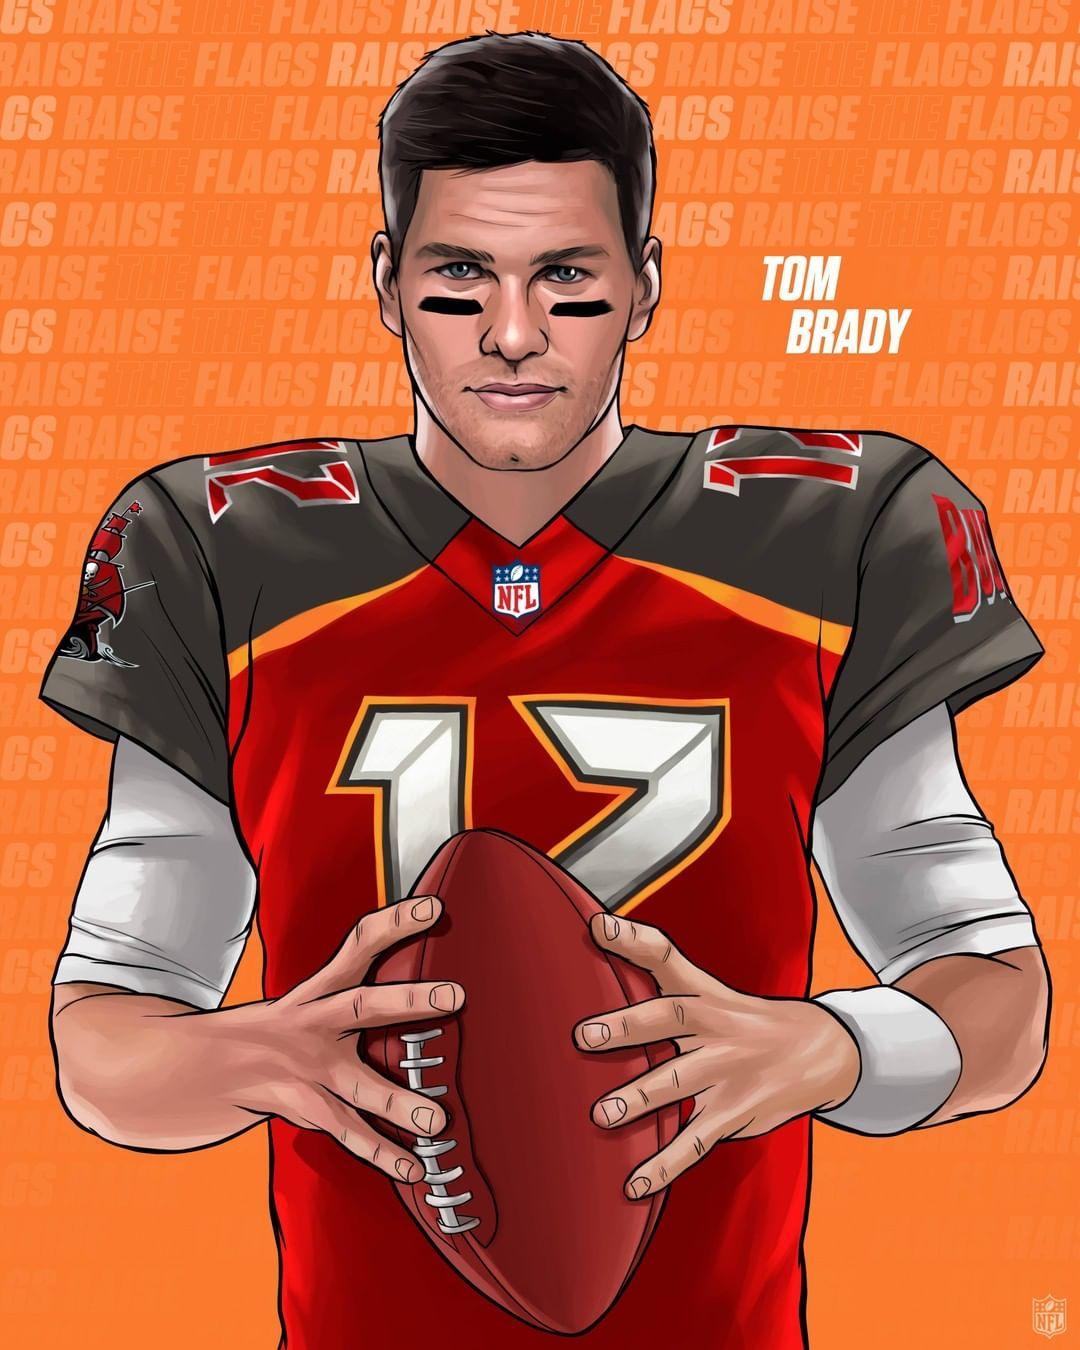 Nfl On Instagram Tom Brady Qb Of The Buccaneers In 2020 Nfl Football Art Nfl Nfl Football Players